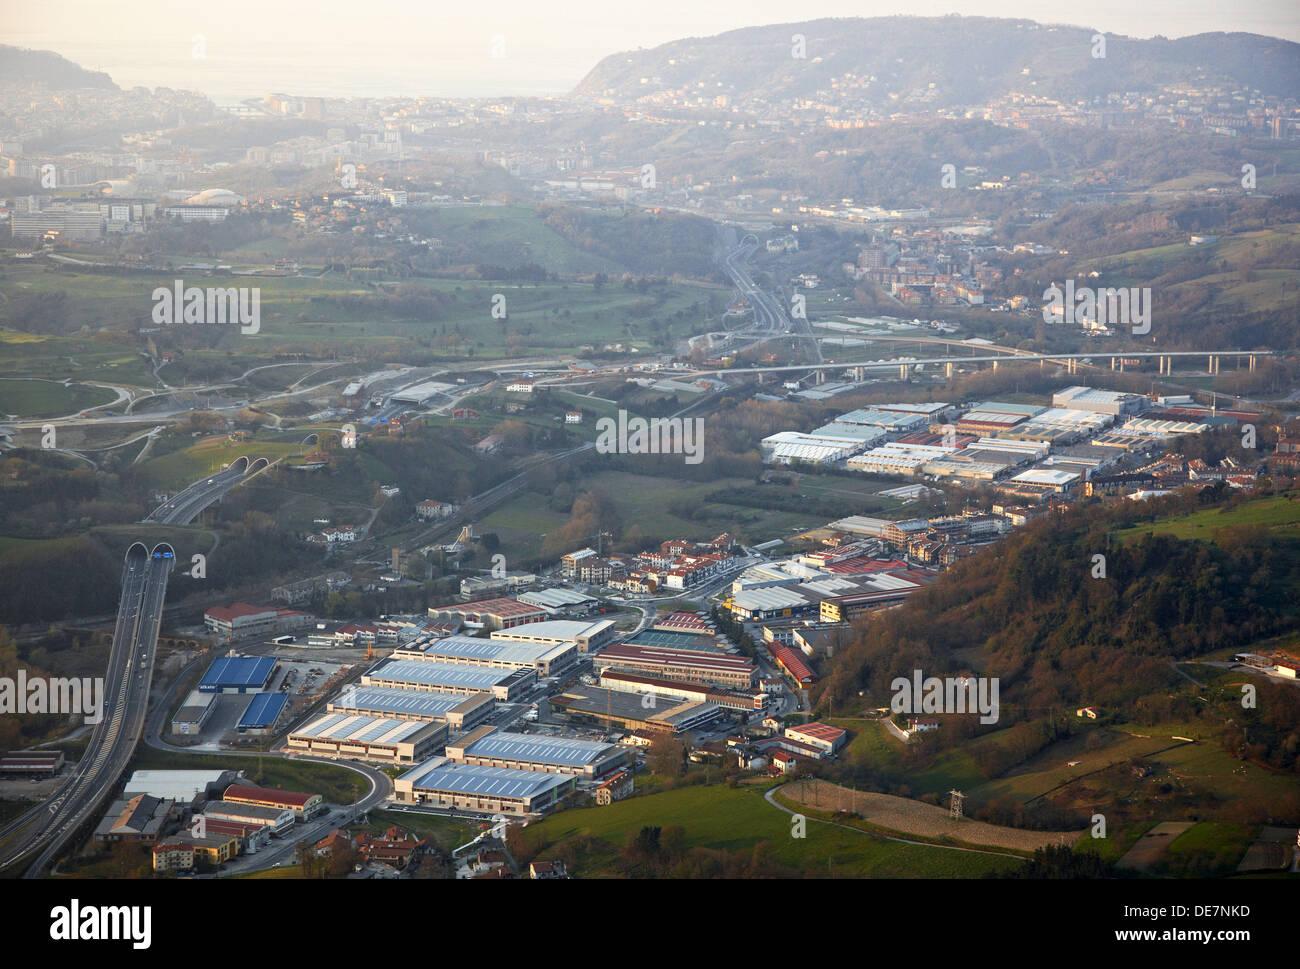 Industrial areas in Ergobia and Astigarraga, near San Sebastián. Donostia, Gipuzkoa, Basque Country, Spain - Stock Image